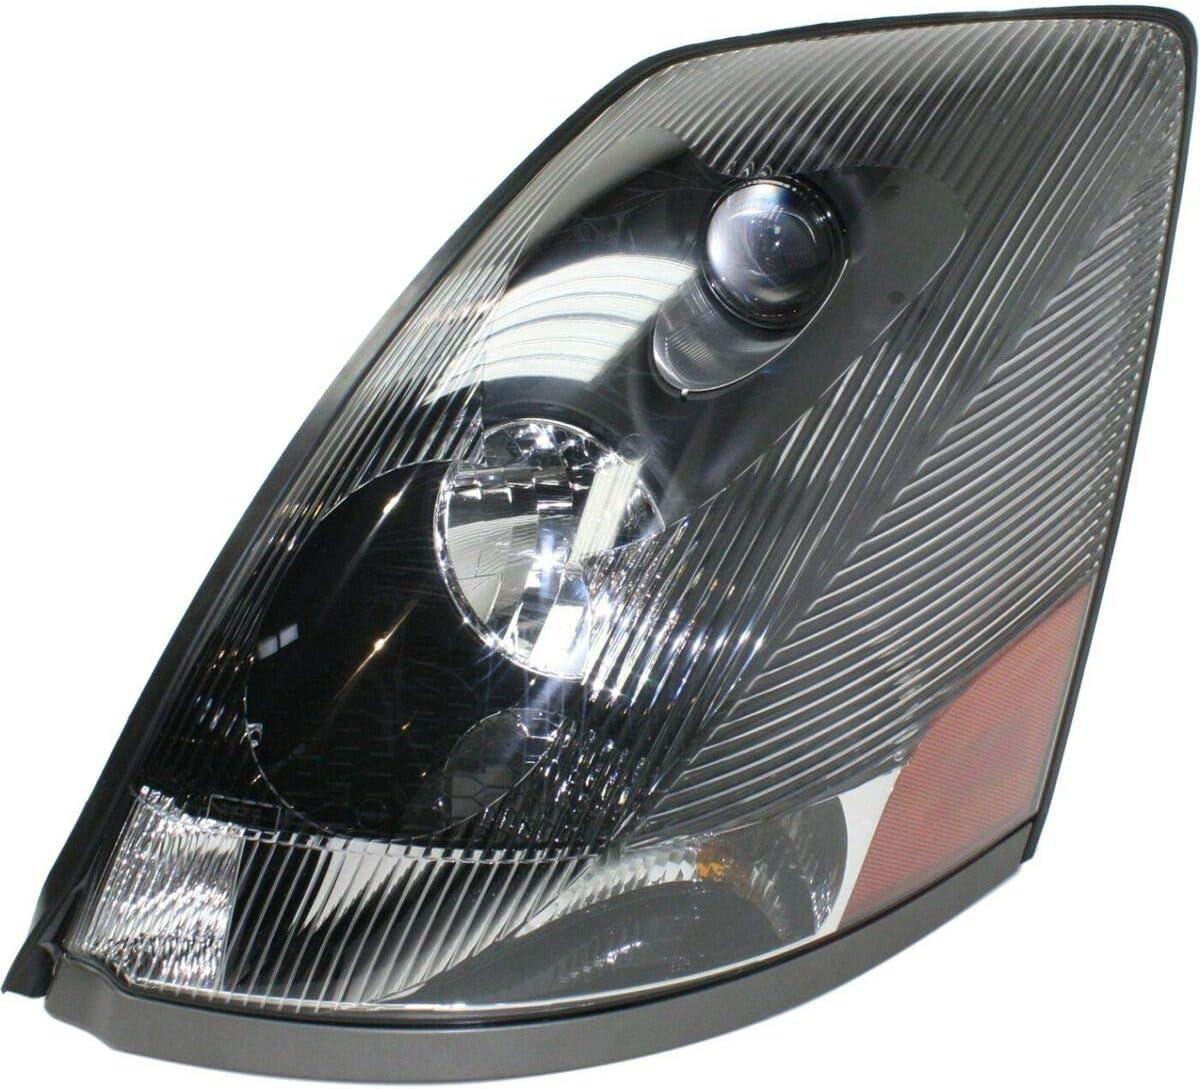 Headlight Headlamp Black Bezel Aero wholesale Lens Sales Left Driver LH Side Com